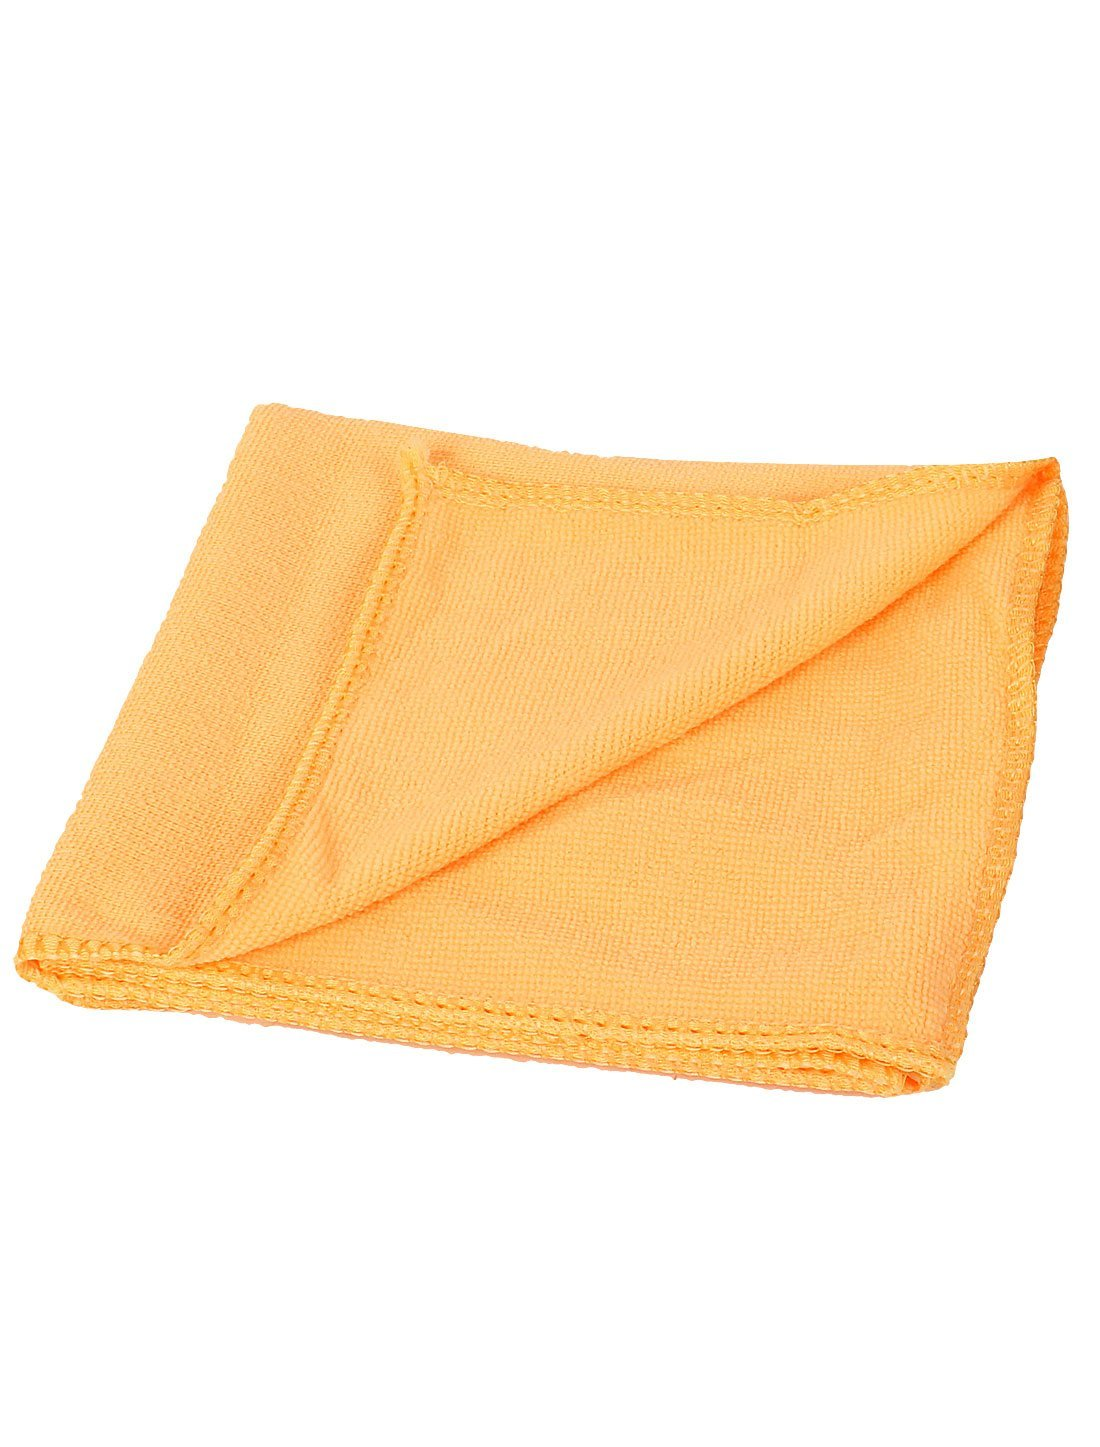 Amazon.com: Microfibra de limpieza del Pelo secado del baño de ducha toalla de Playa 70x30cm Naranja: Health & Personal Care